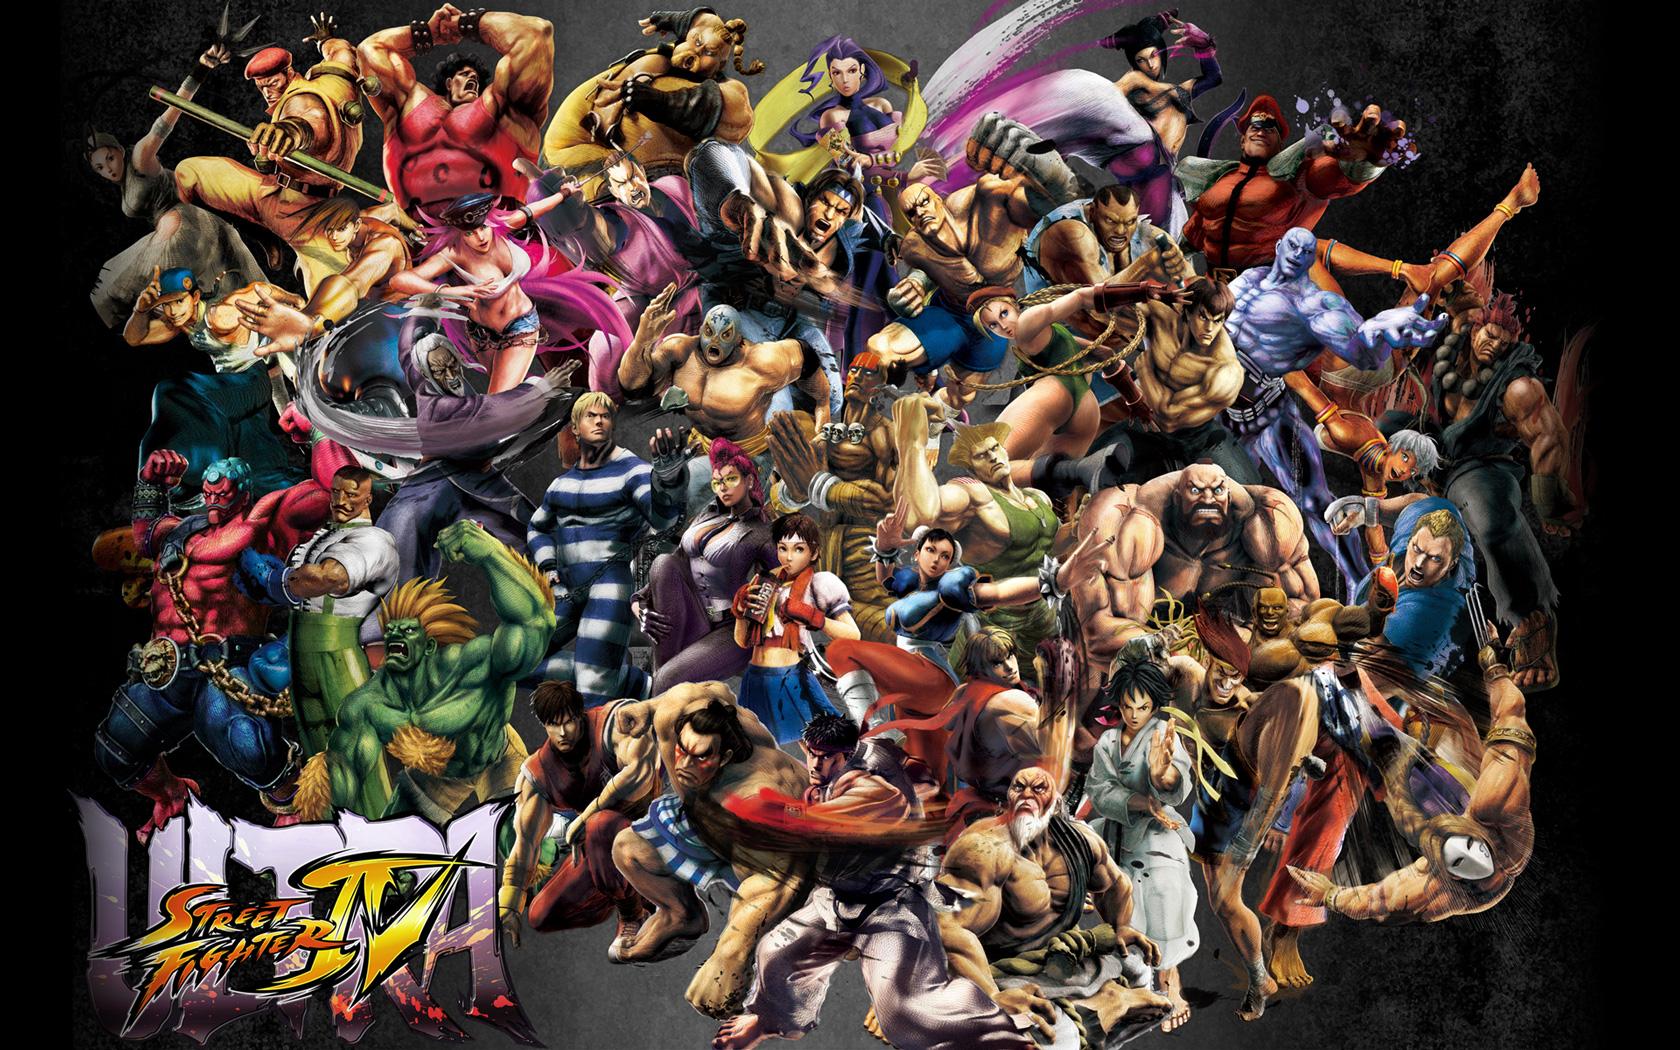 Ultra Street Fighter IV Wallpaper in 1680x1050